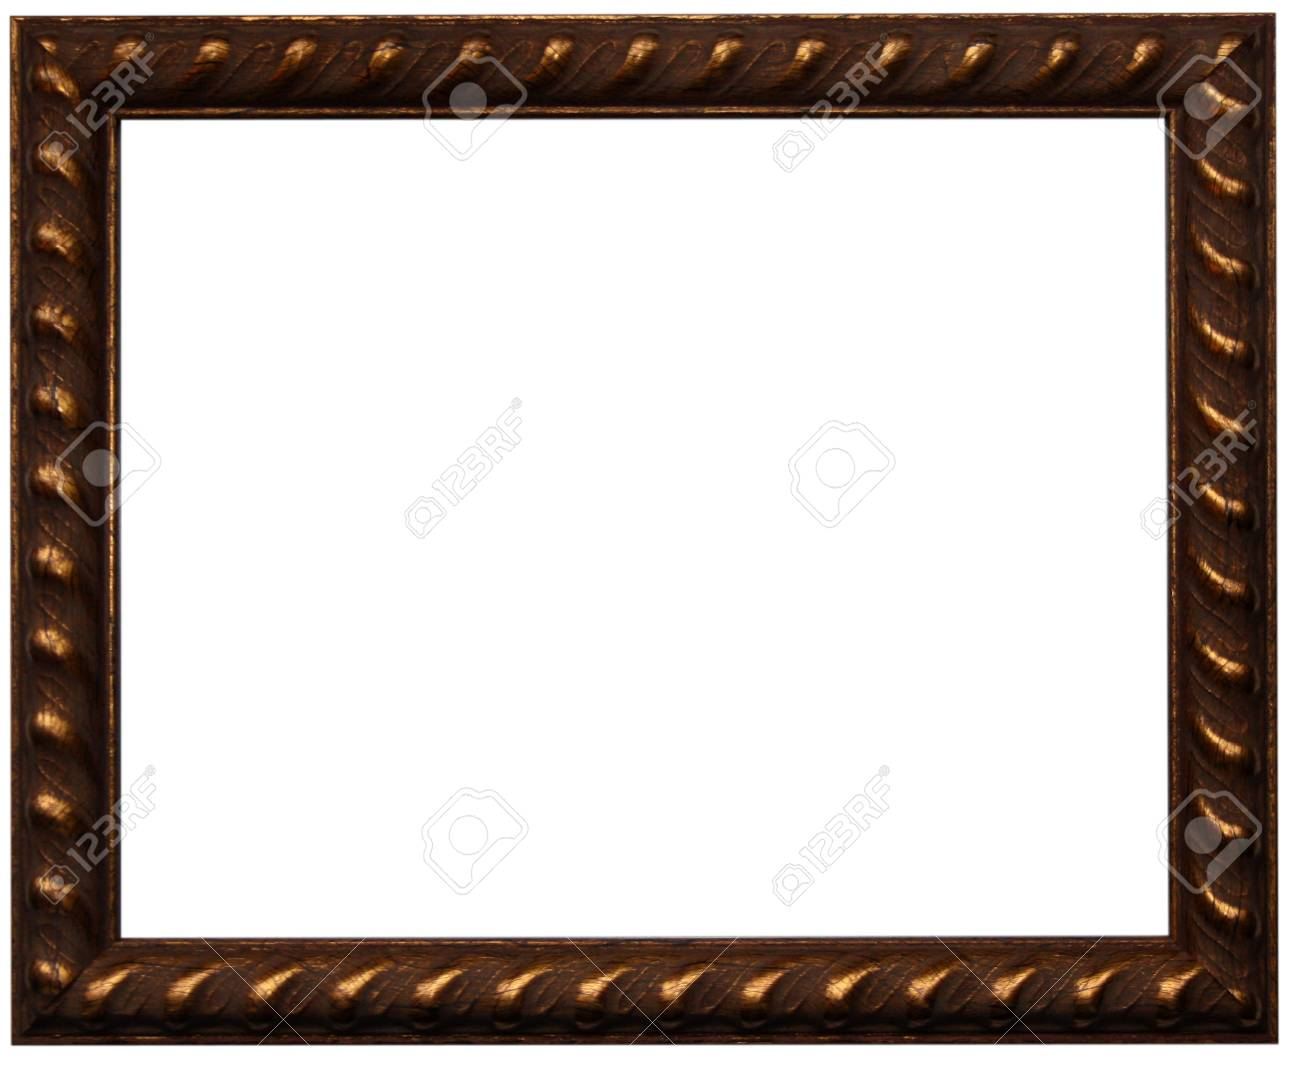 Brown photo frame - 17330425